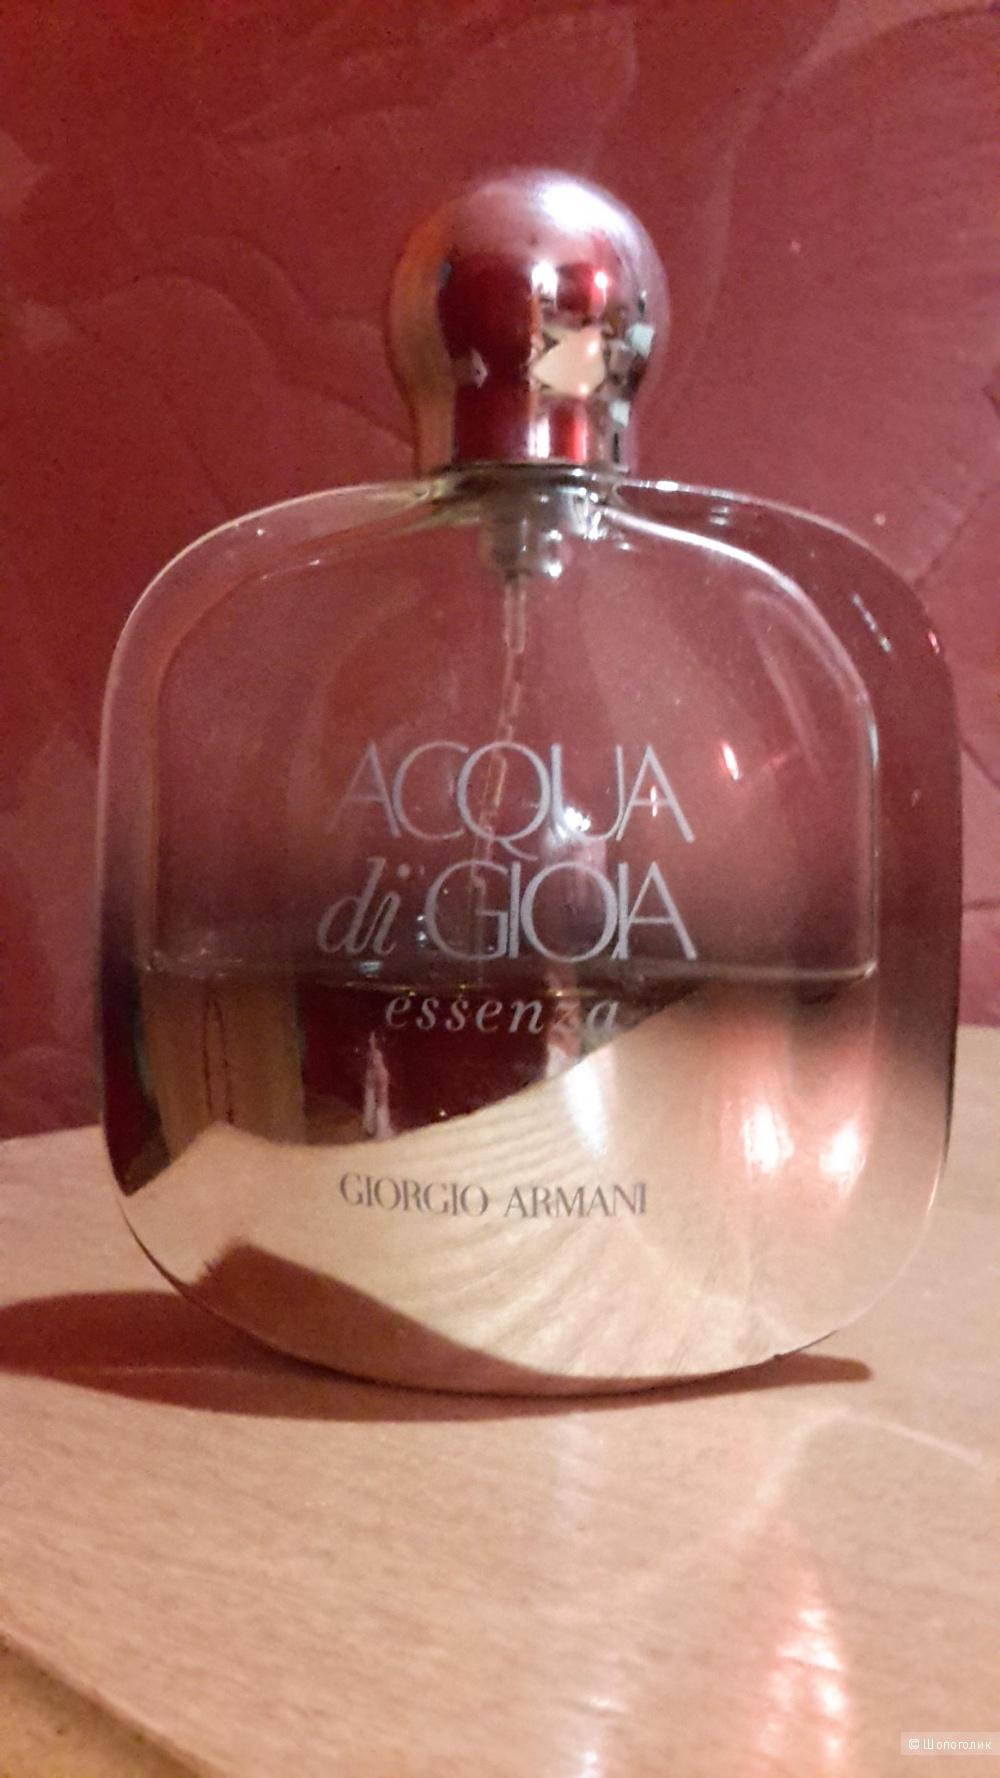 Парфюмированная вода Acqua di Gioia Essenza Giorgio Armani  50 мл